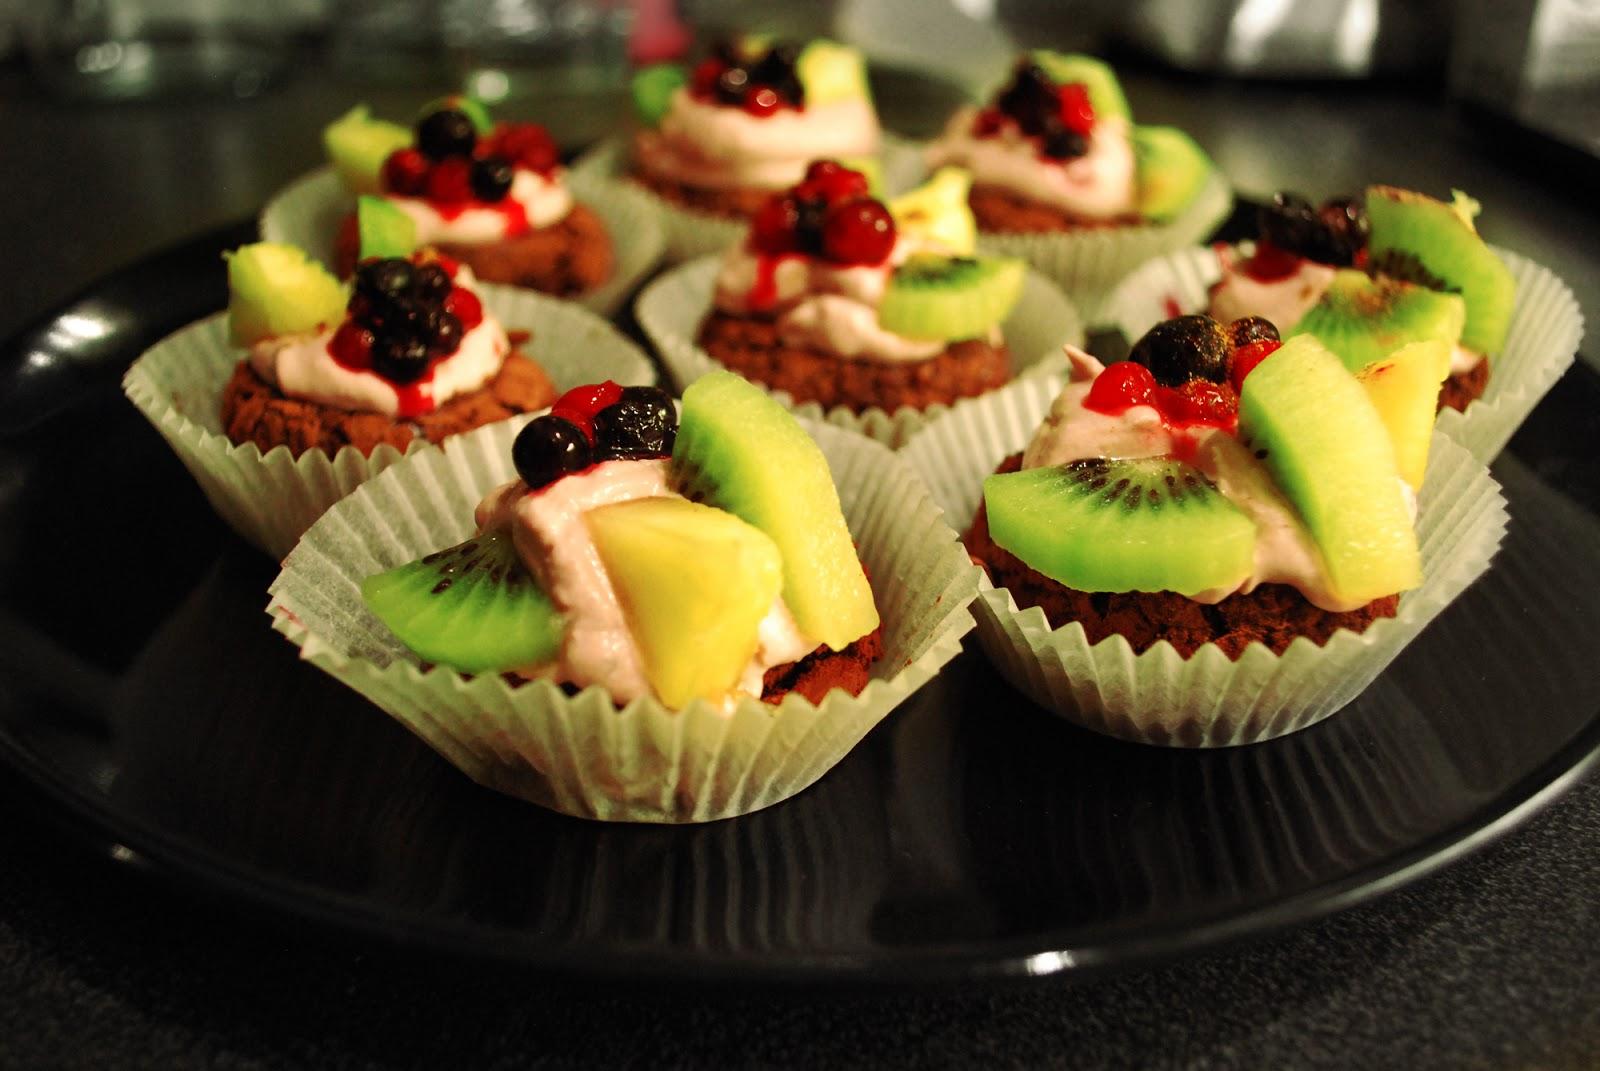 Spiced Blueberry Shake: Raw Chocolate Vanilla Cupcakes